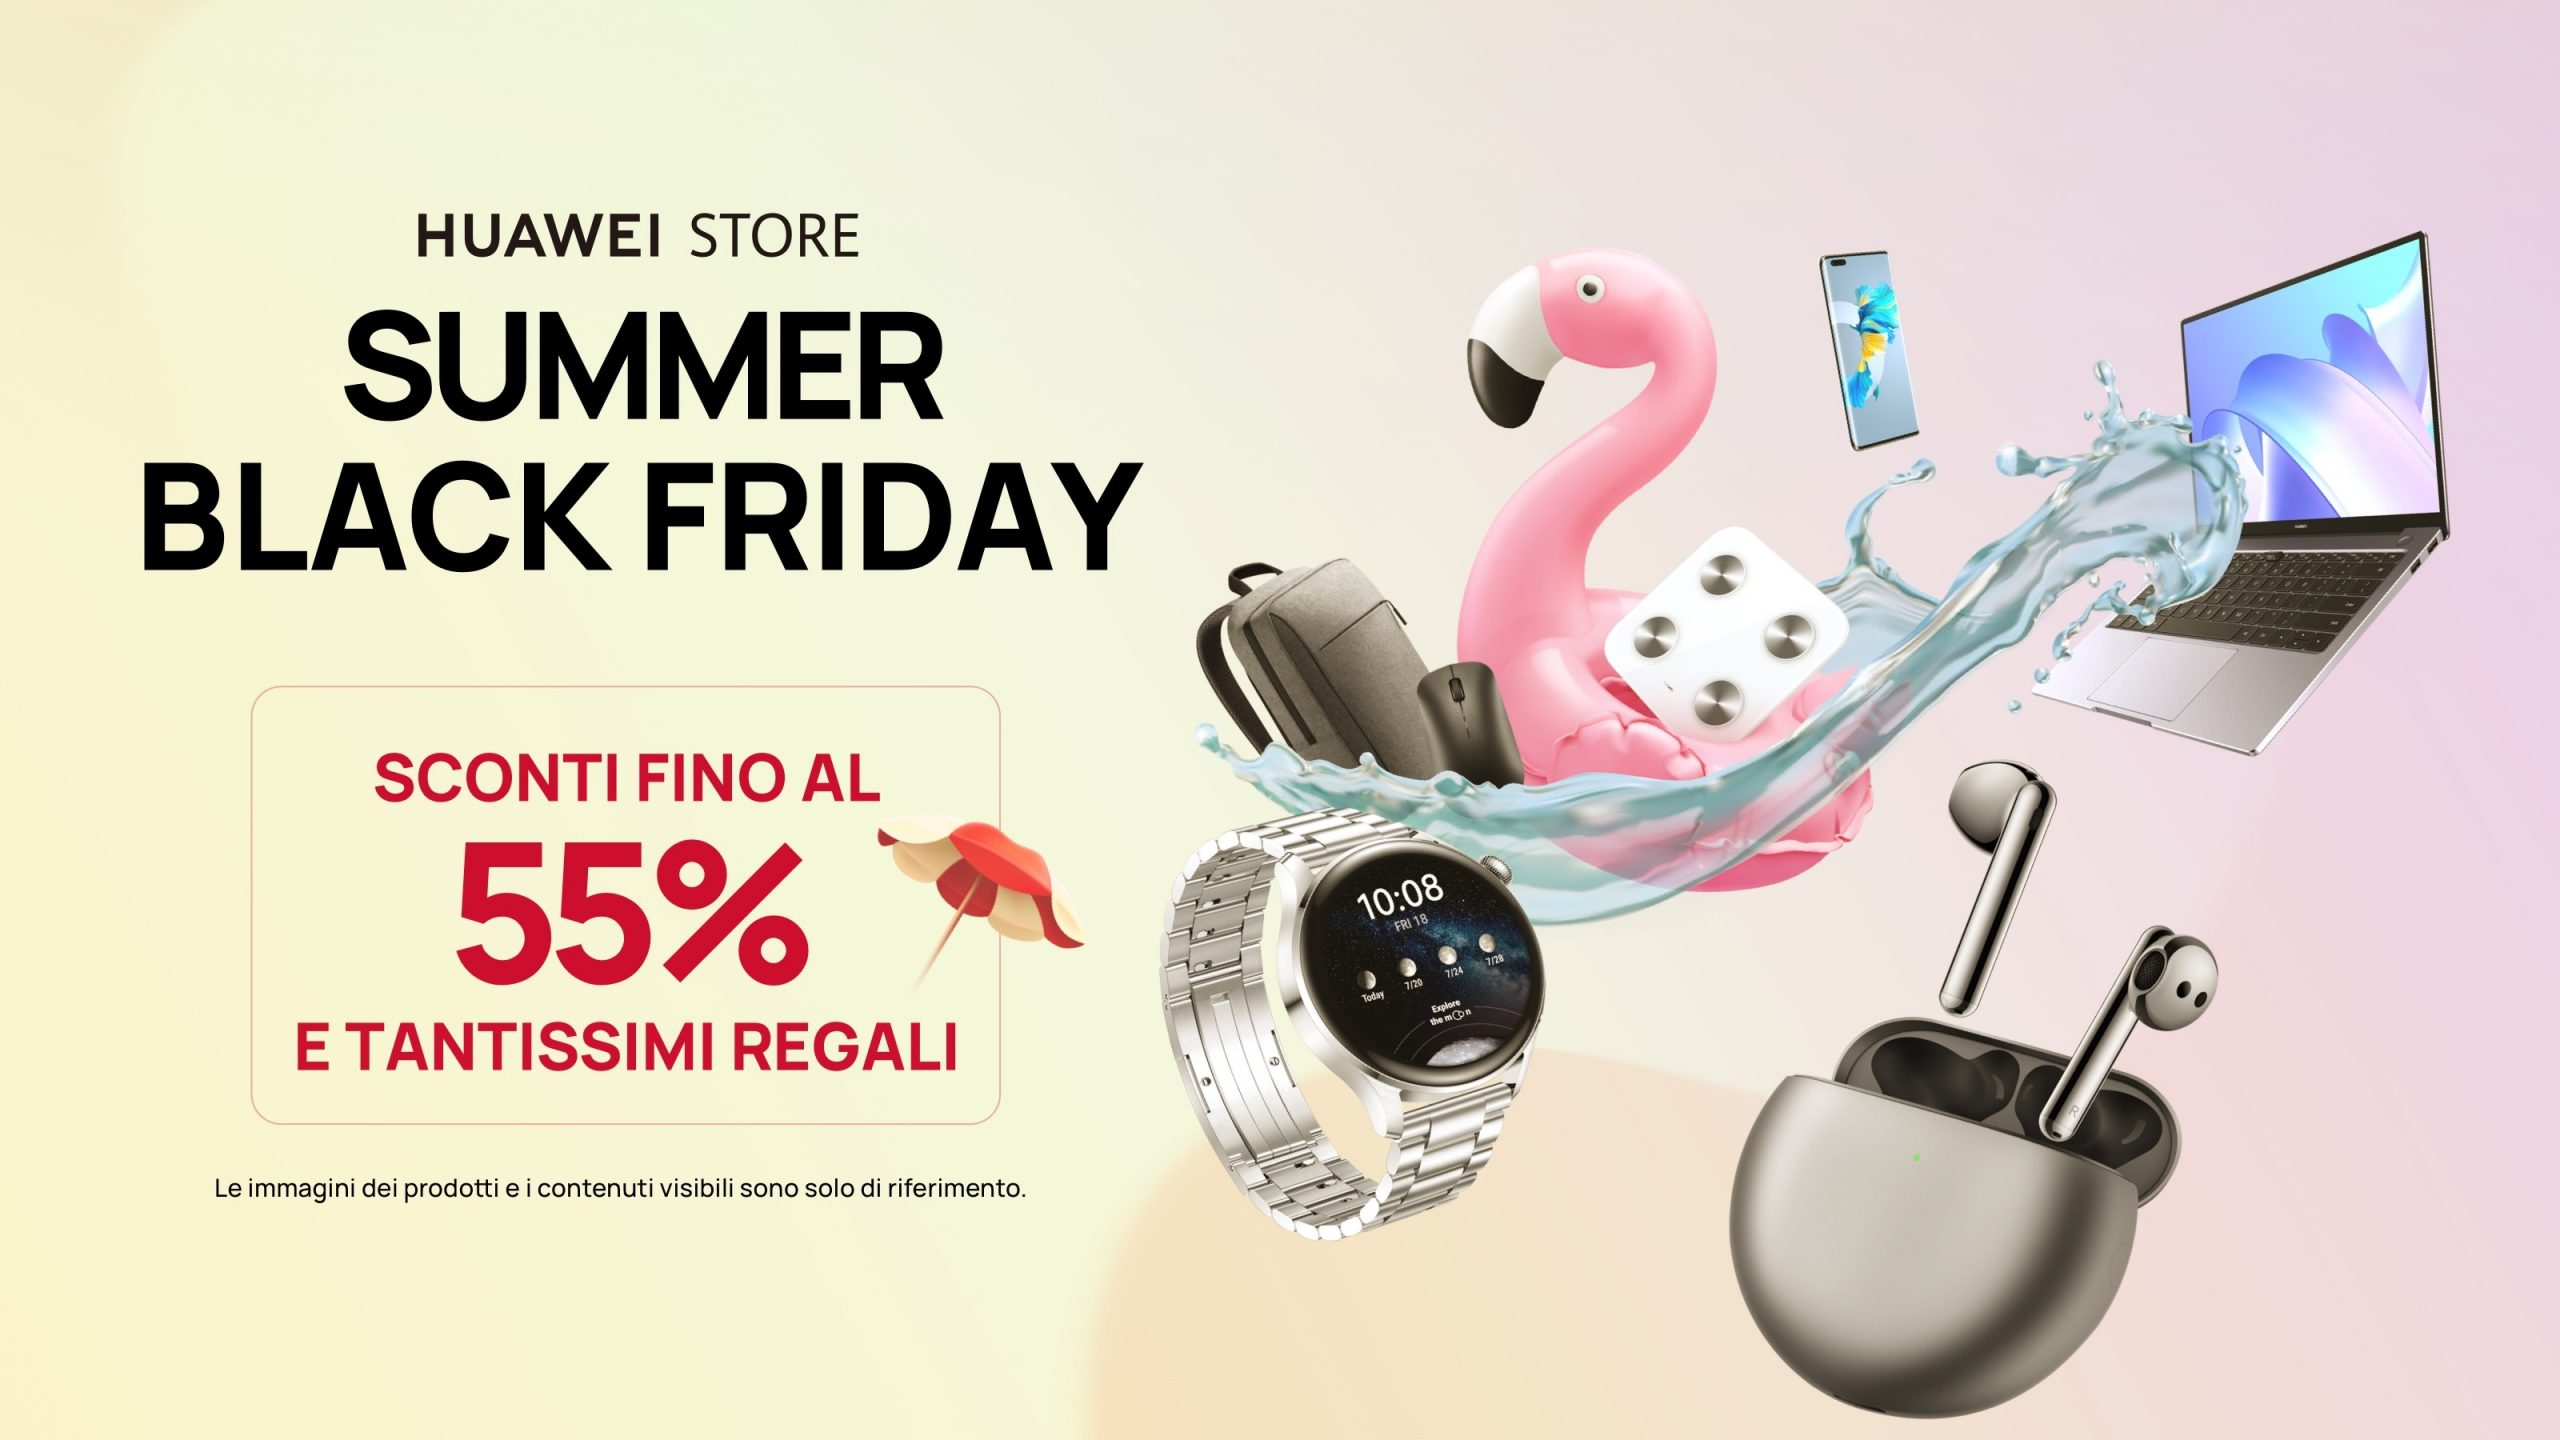 Huawei Summer Black Friday - Offerte e promozioni